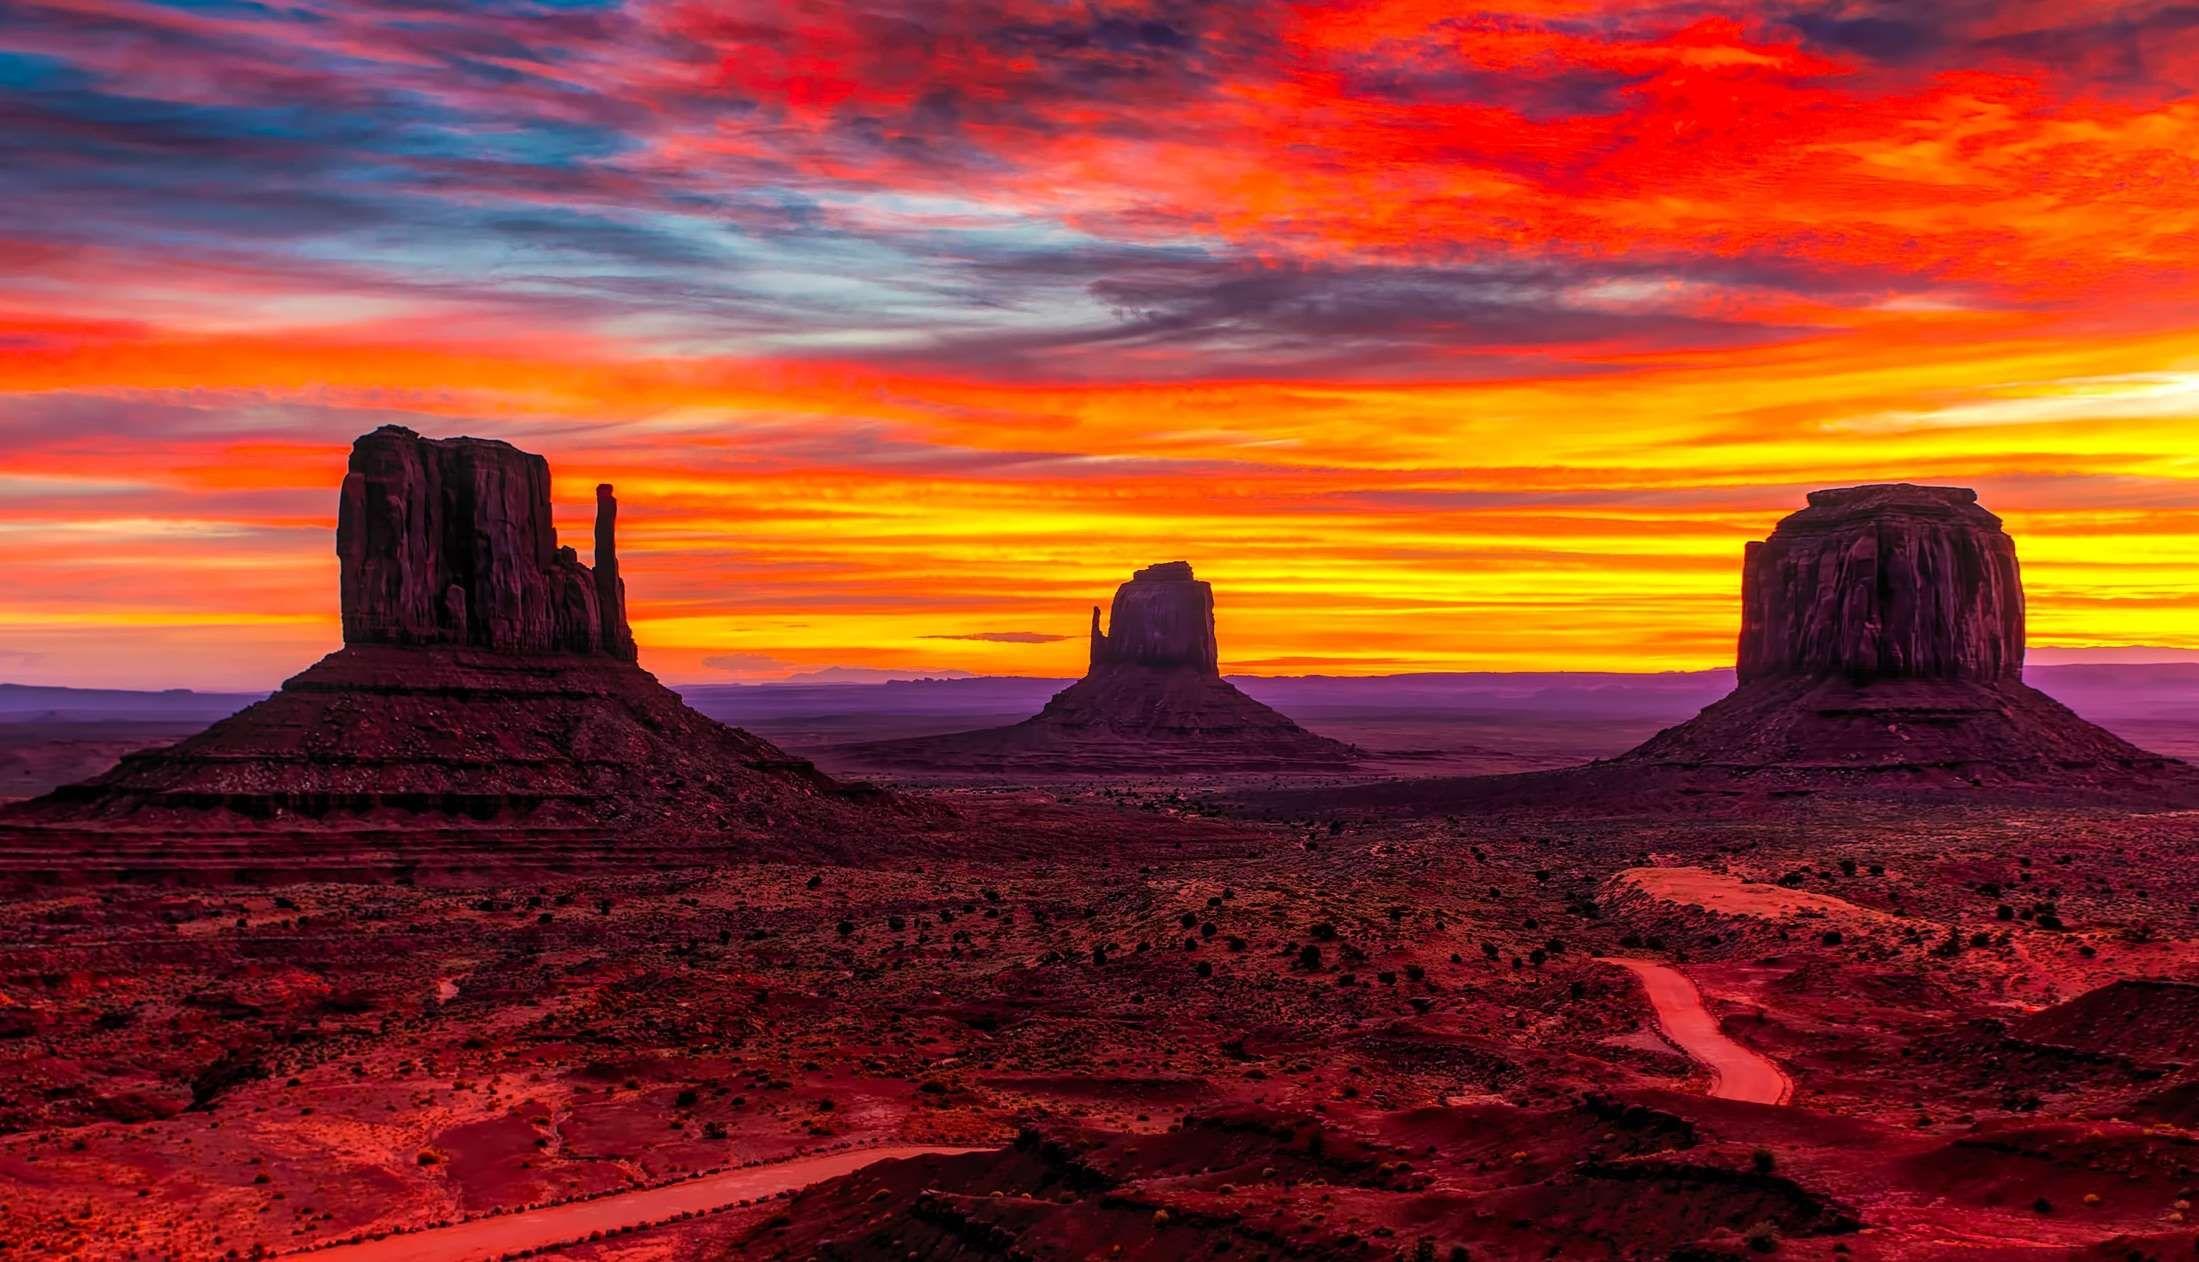 Arizona Clouds Dawn Desert Dusk Geology Landscape Monument